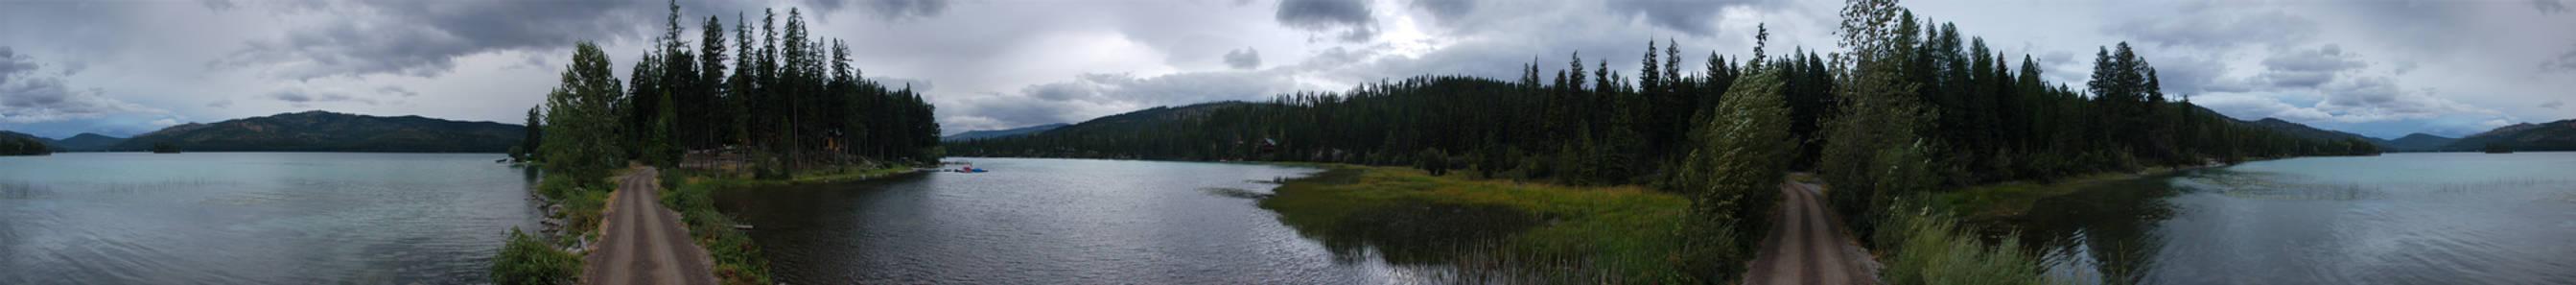 Ashley Lake 2 2007-08-19